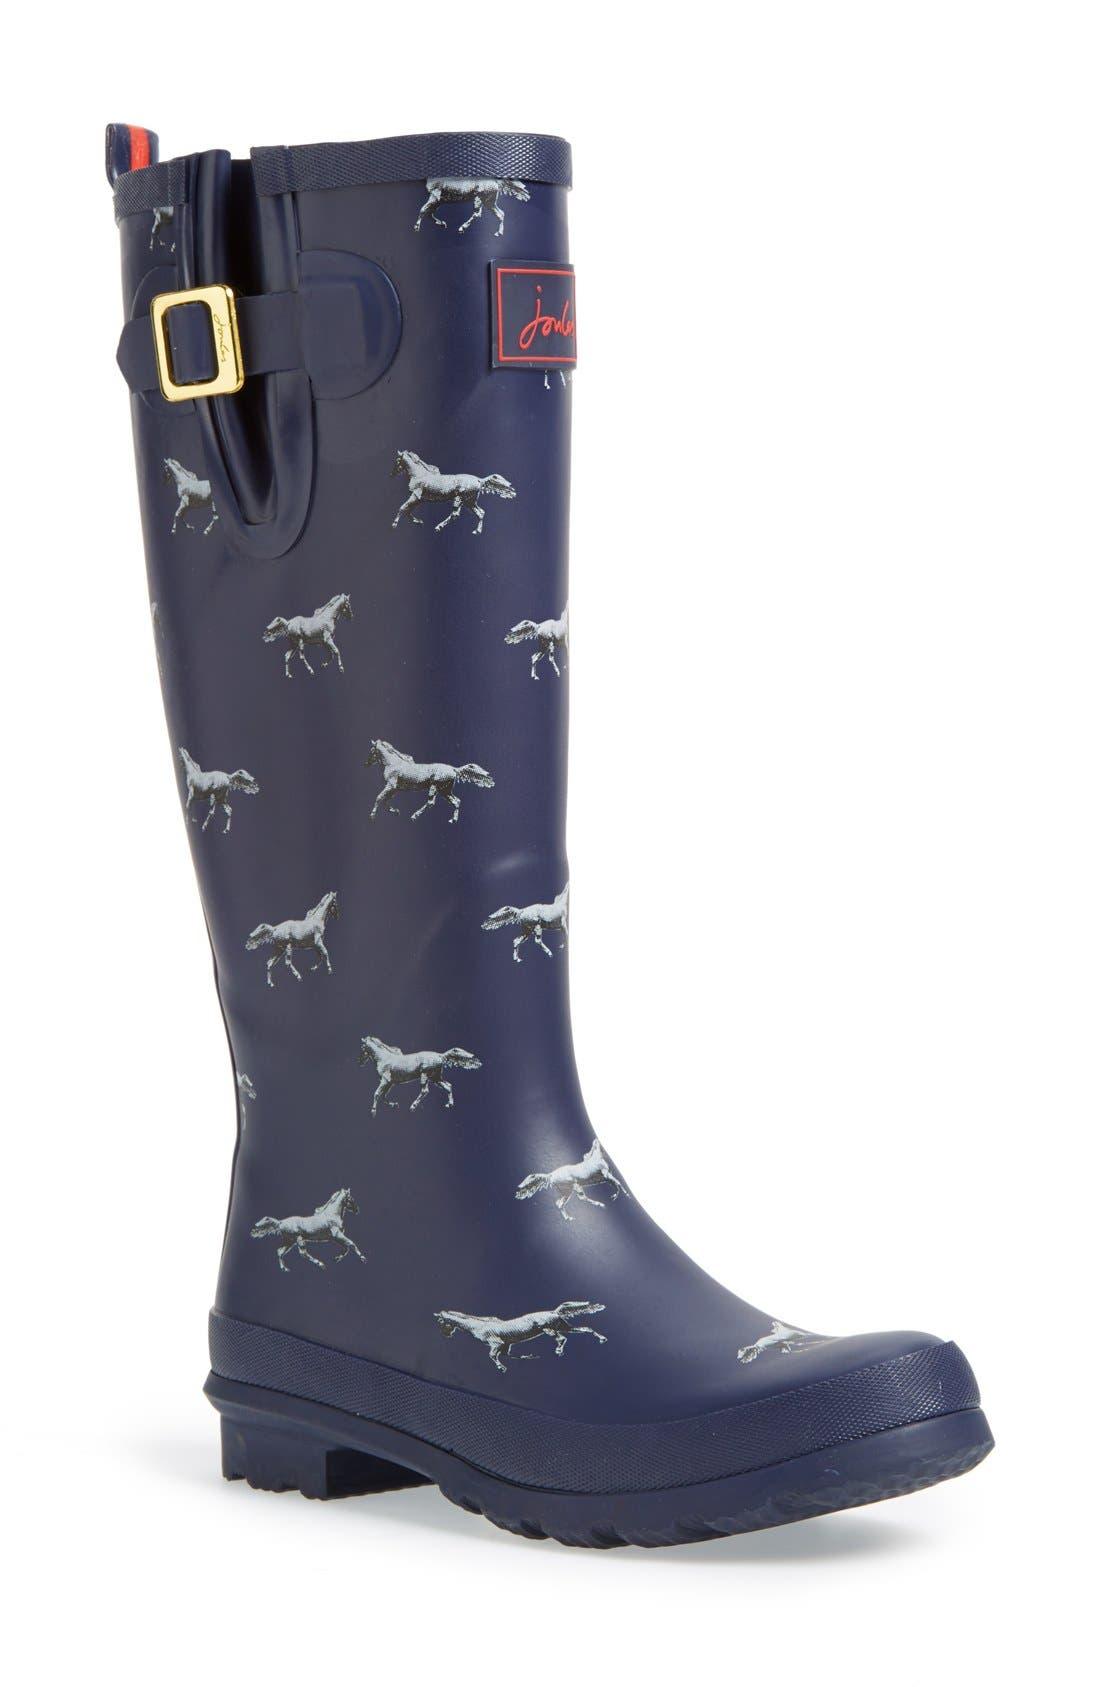 Main Image - Joules Print Welly Rain Boot (Women)